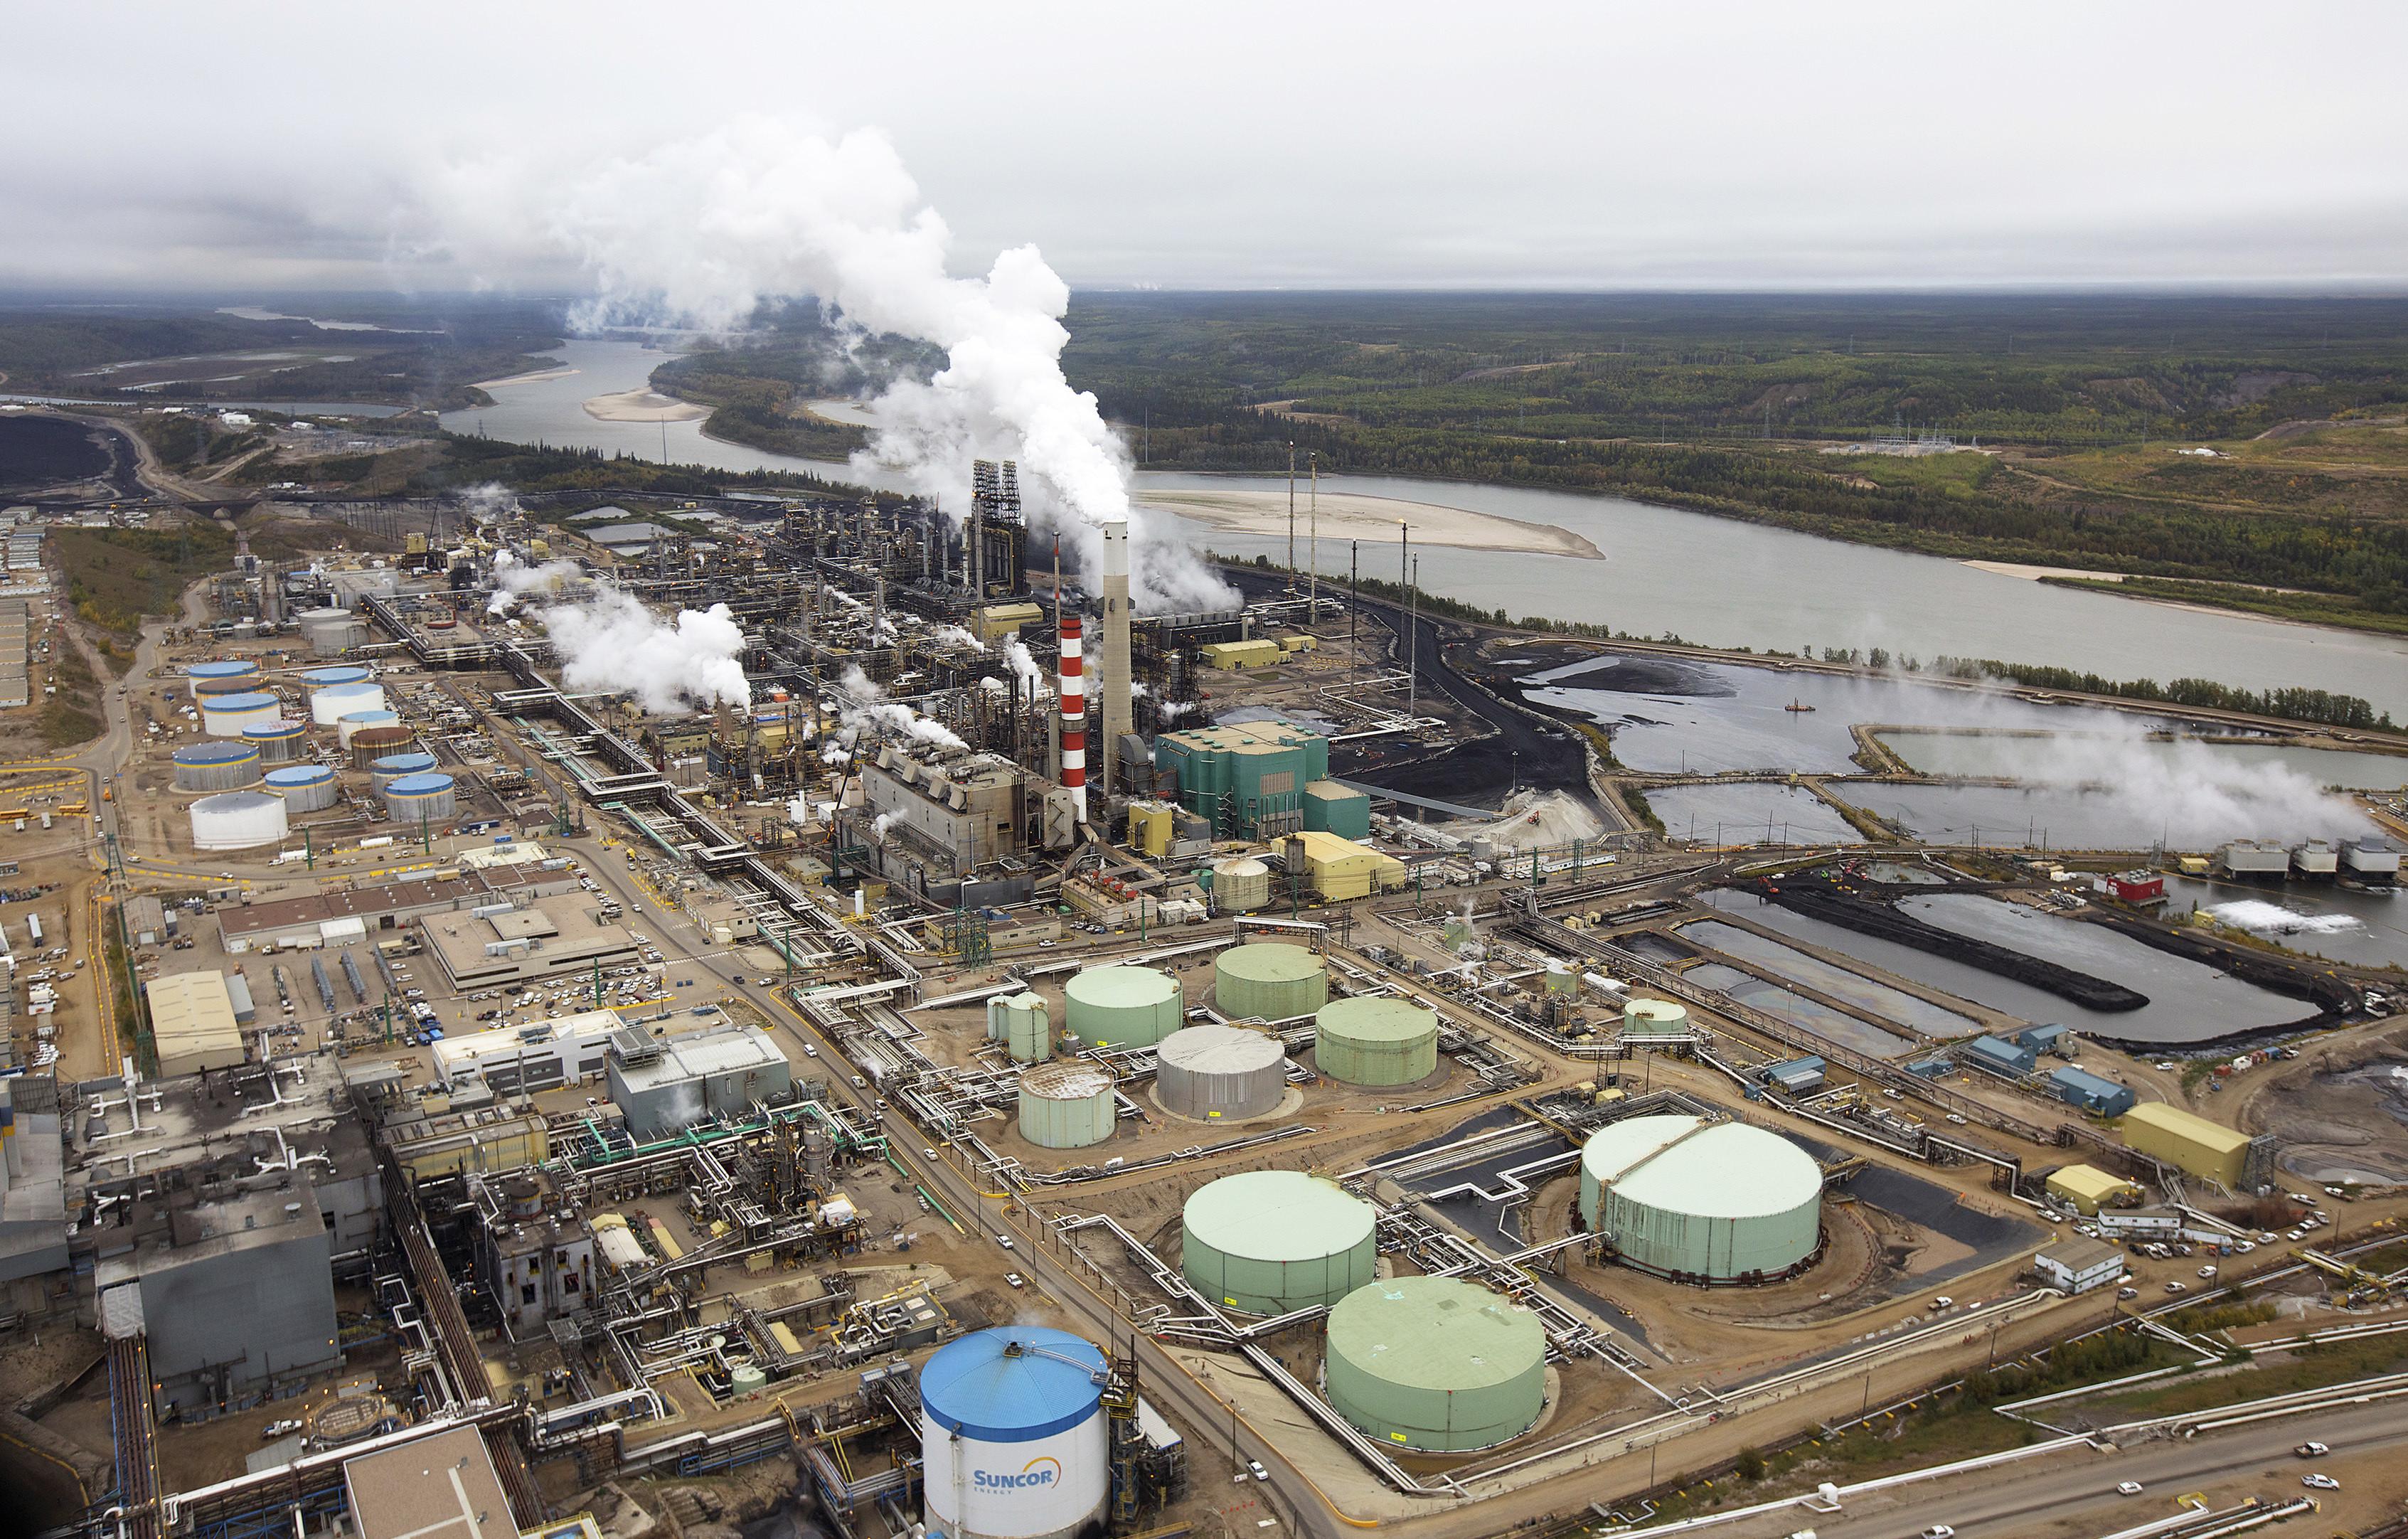 The Suncor oil sands processing plant near the Athabasca River, Alberta, Canada.